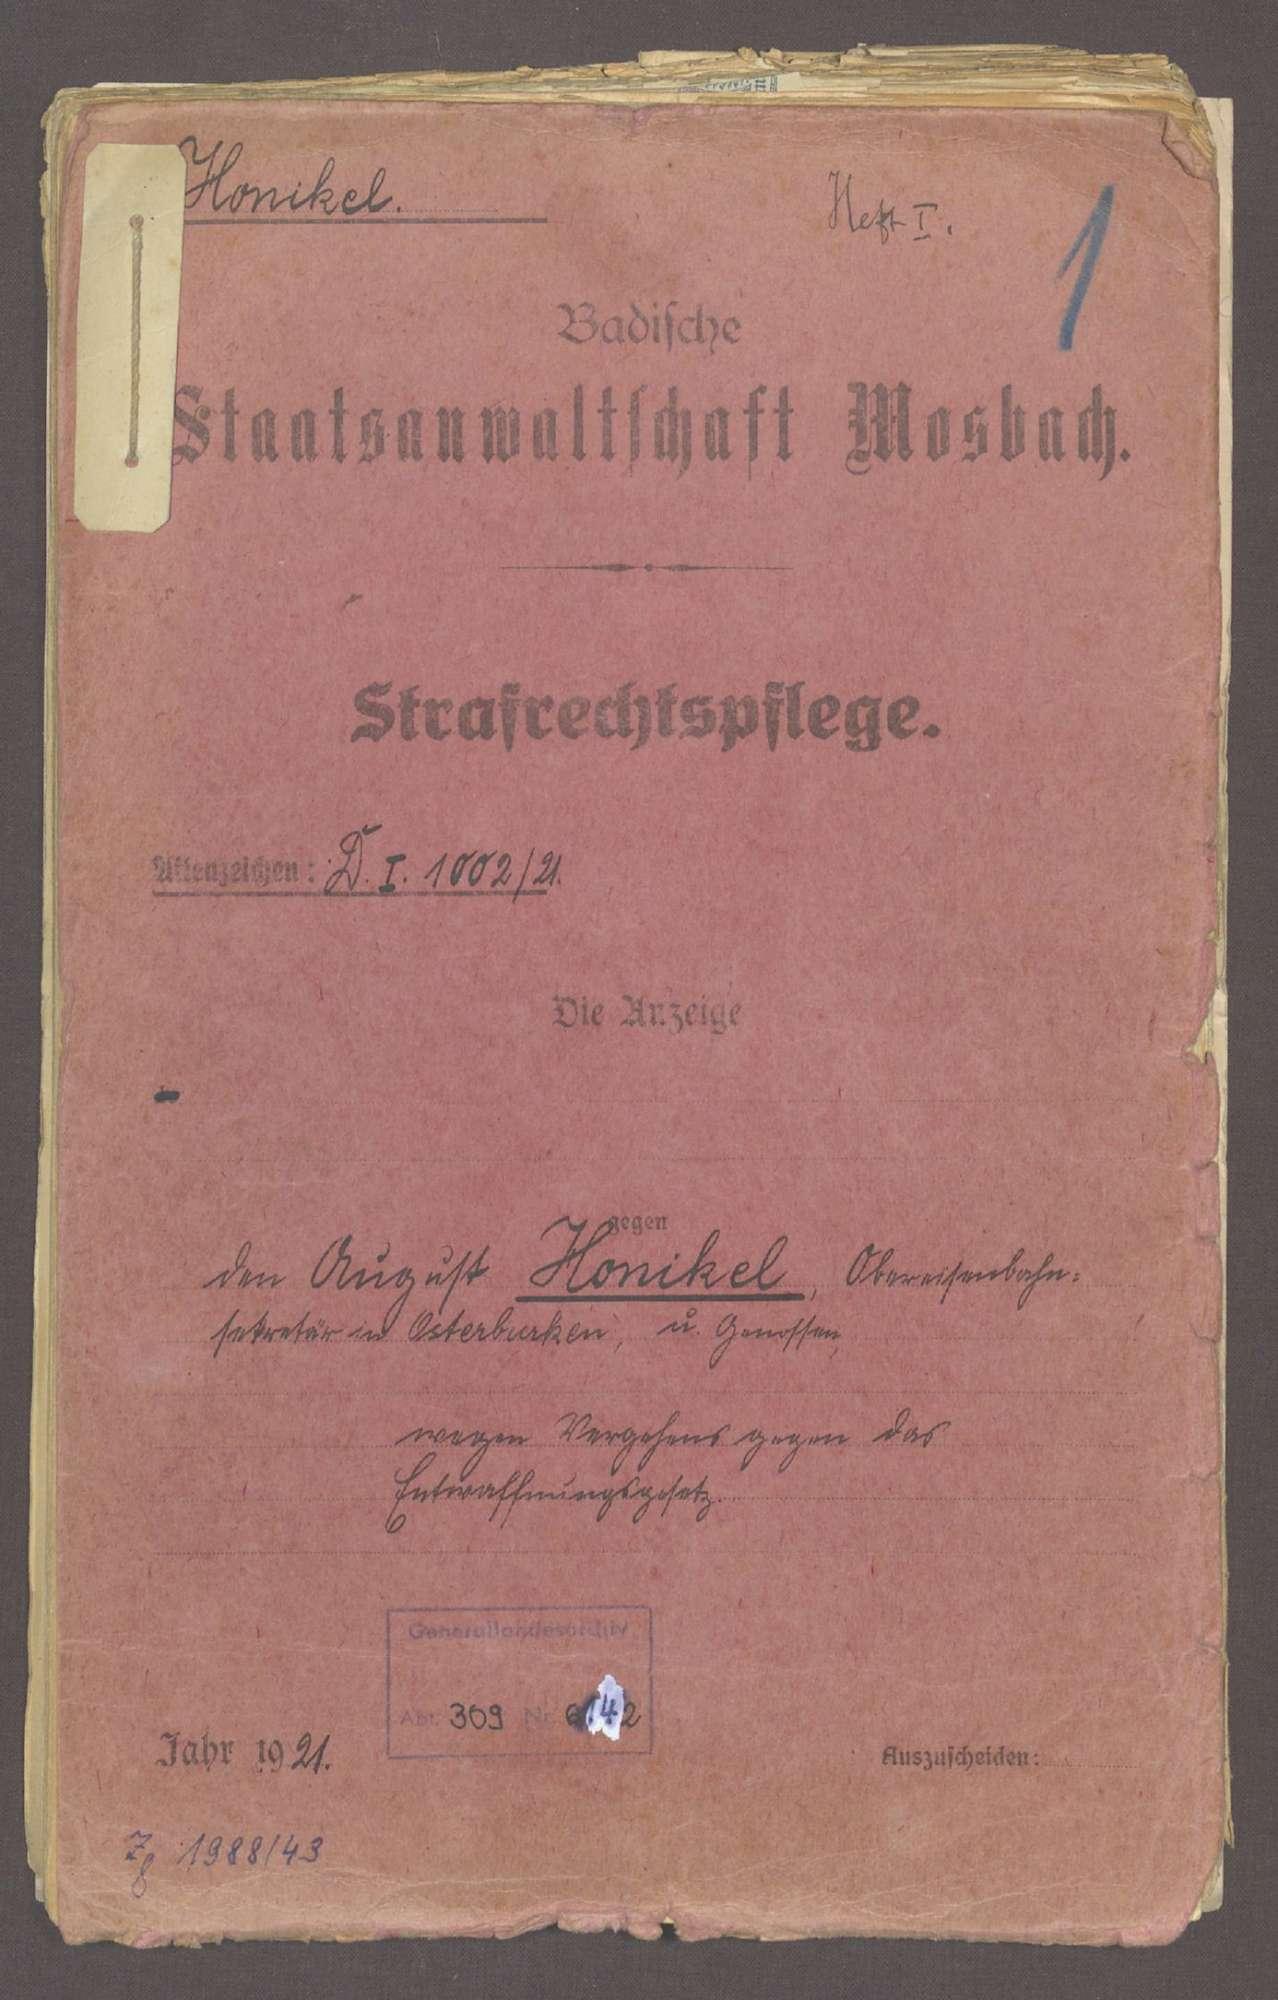 Honikel, August, geb. 09.12.1884 in Dittwar, Obereisenbahnsekretär, Bild 1